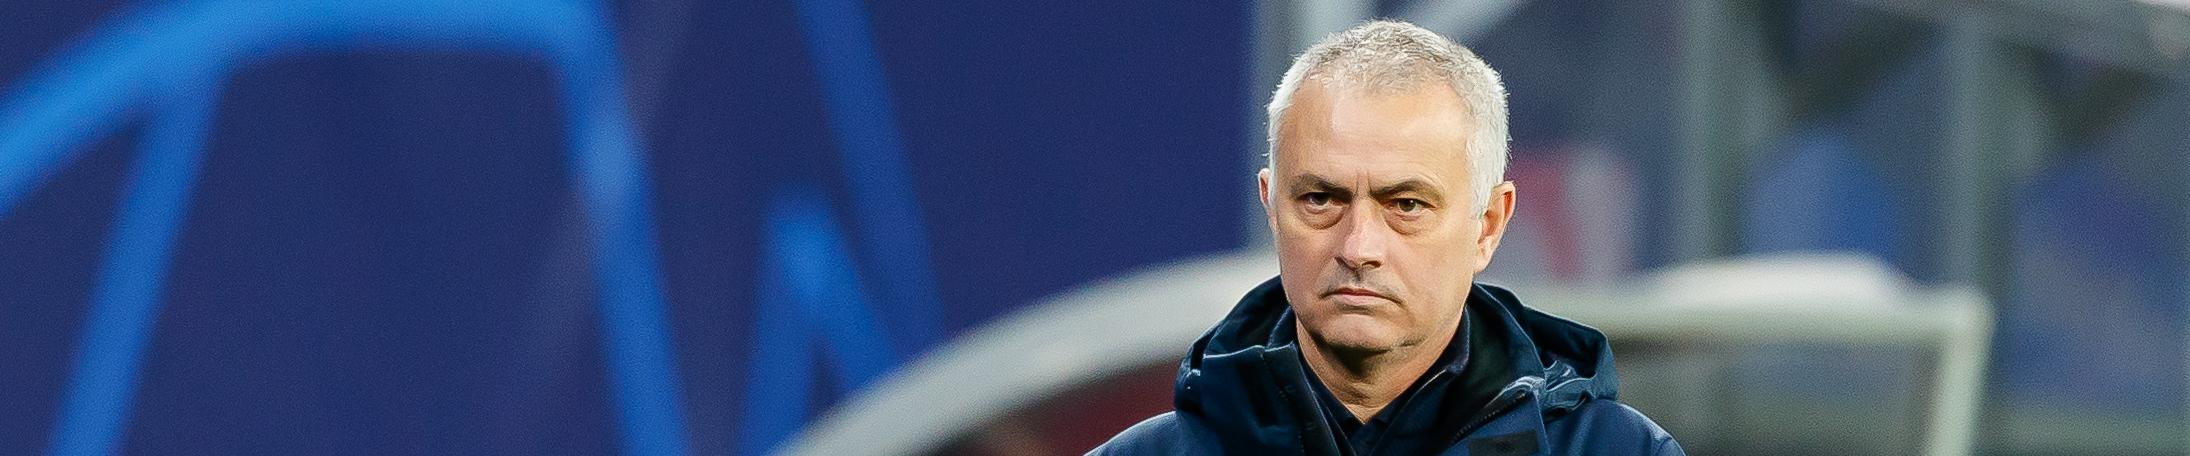 Scommesse sportive, il palinsesto bwin del 23/06/2020: Premier League e basket